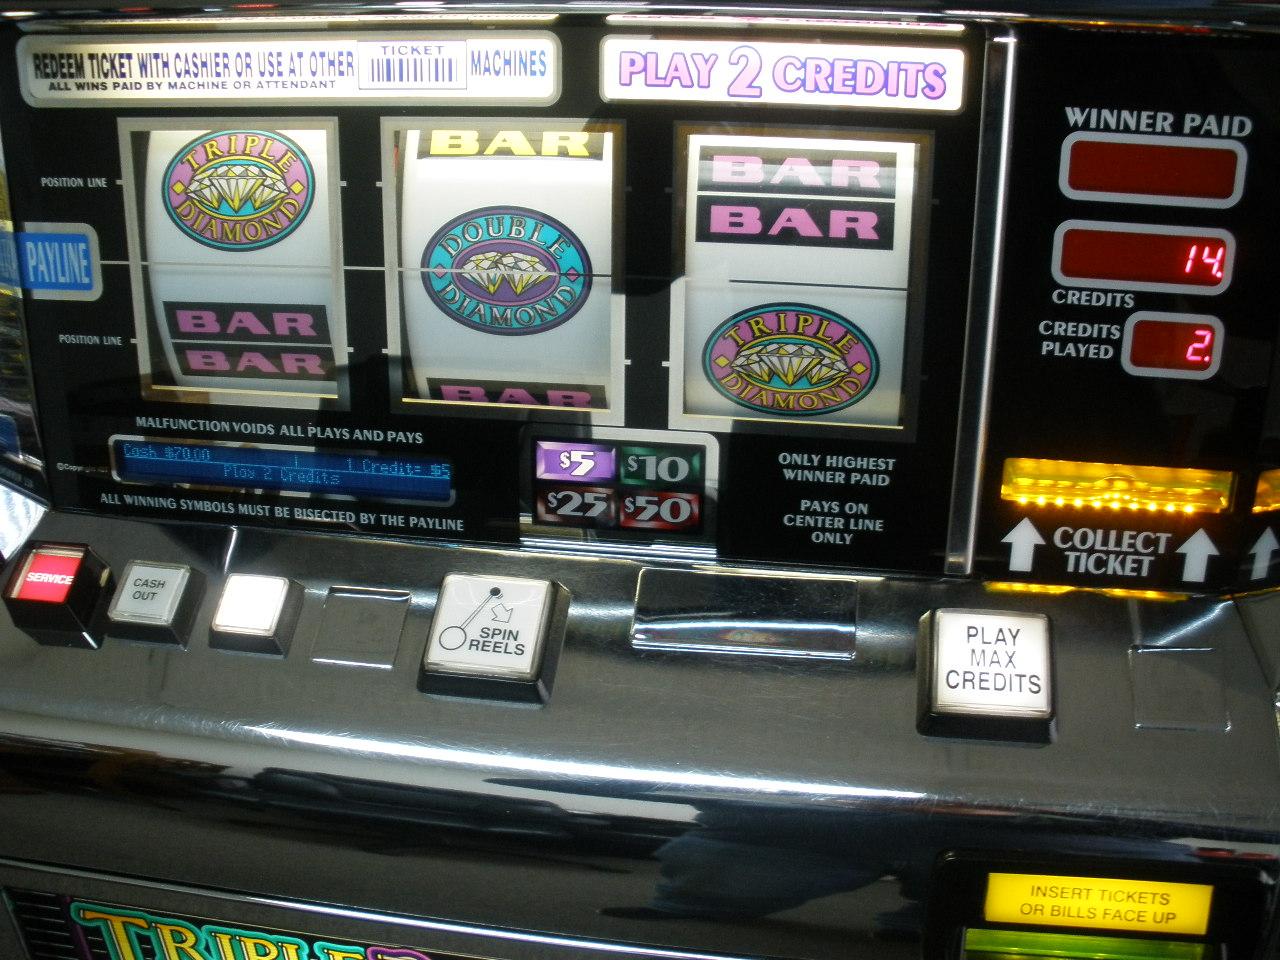 Double Diamonds Slot Machine